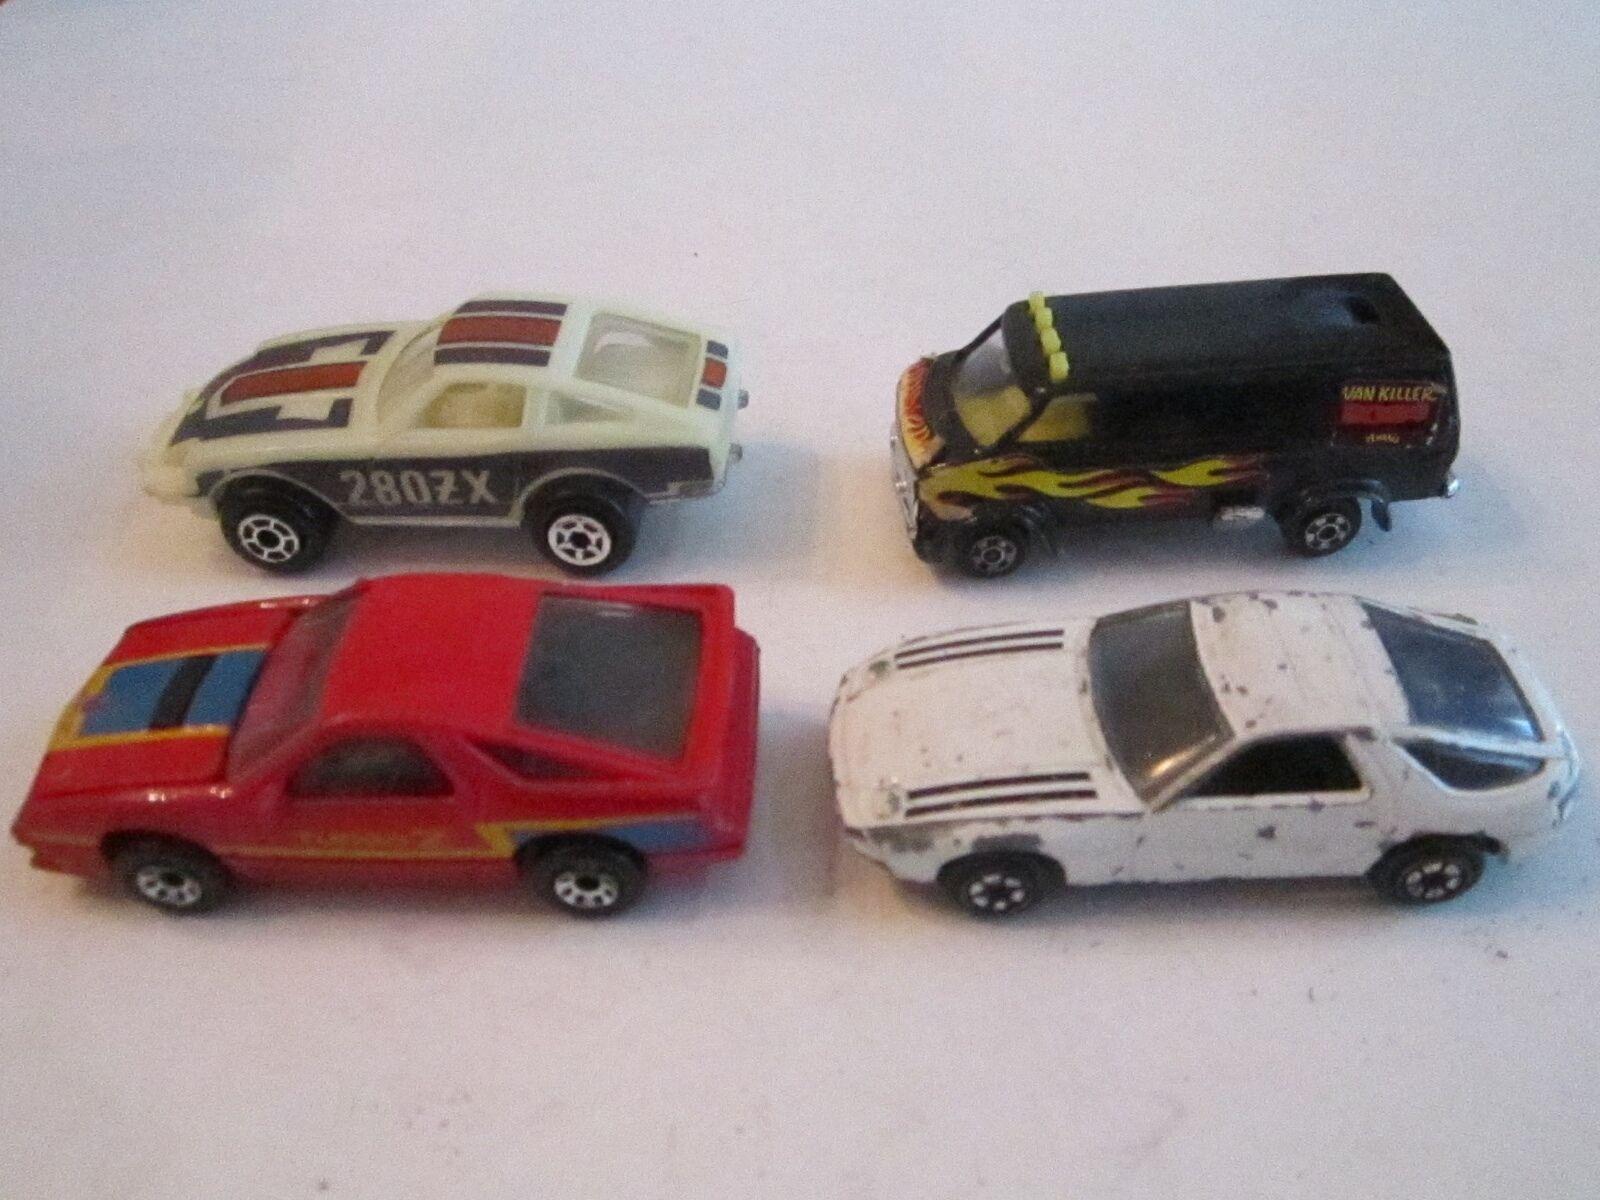 4 VINTAGE TOY CARS - ZYLMEX, '84 MATCHBOX & MORE - MB 1